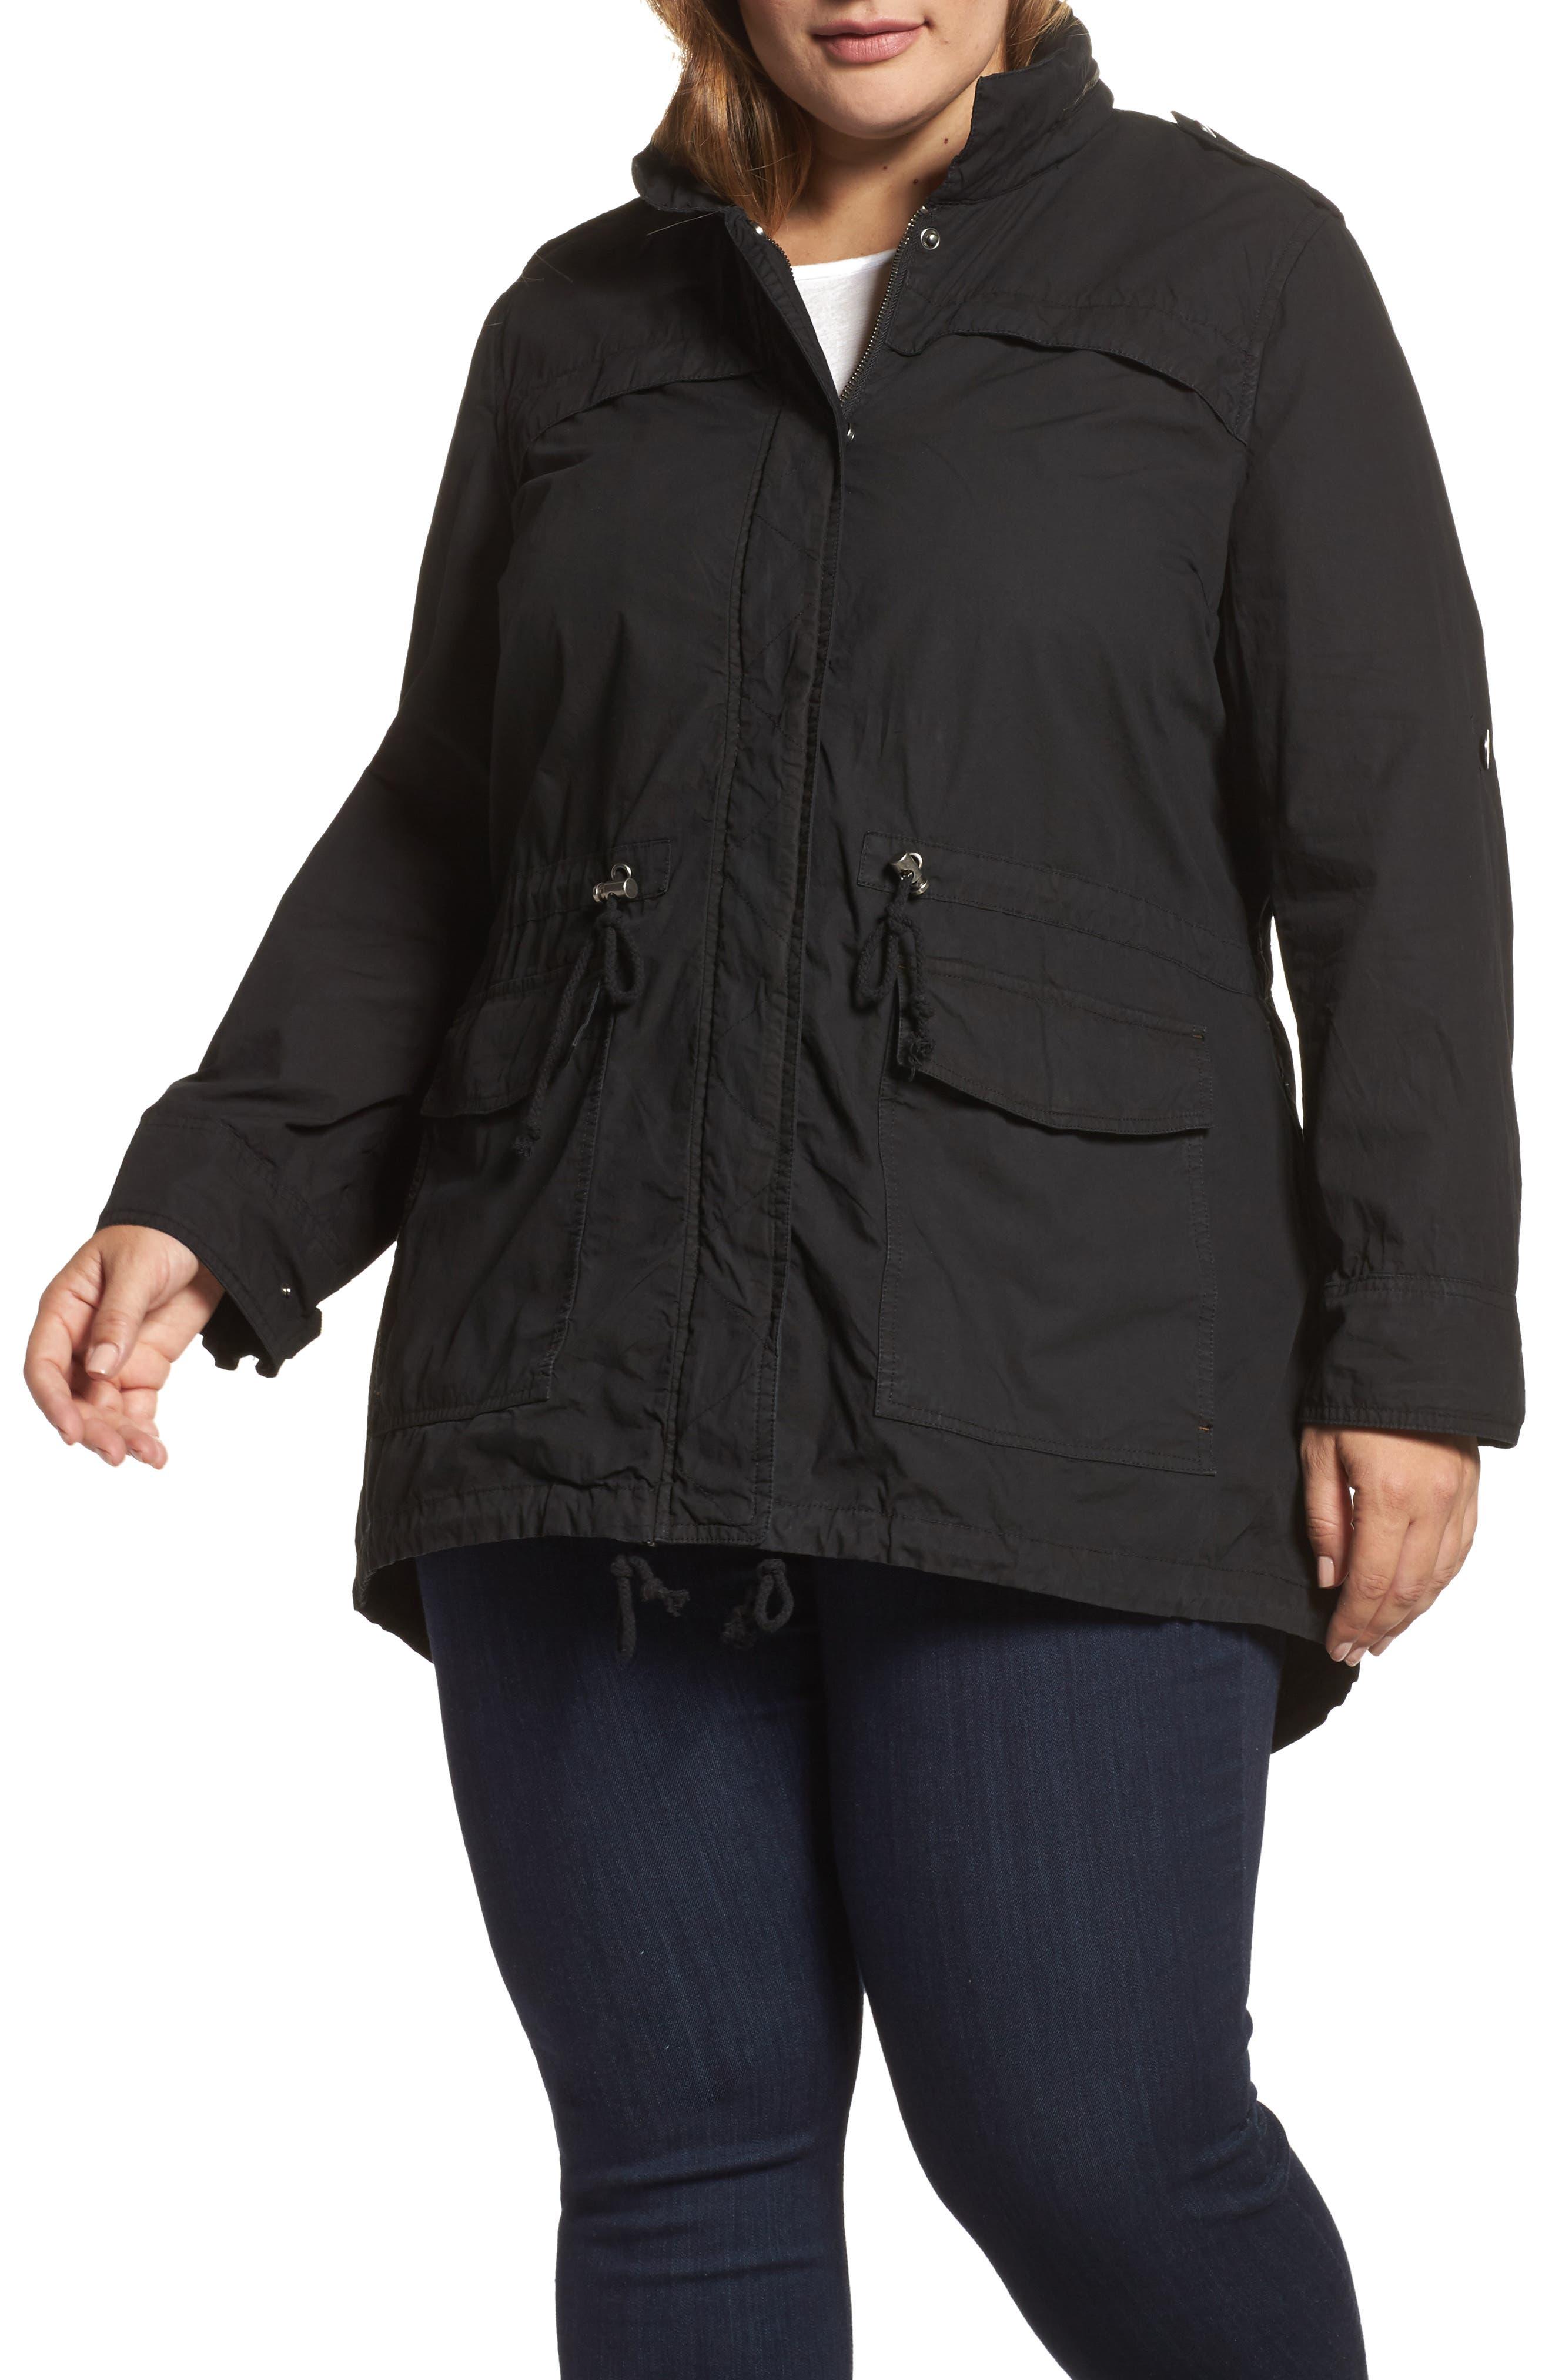 Alternate Image 1 Selected - Levi's® Parachute Hooded Cotton Utility Jacket (Plus Size)